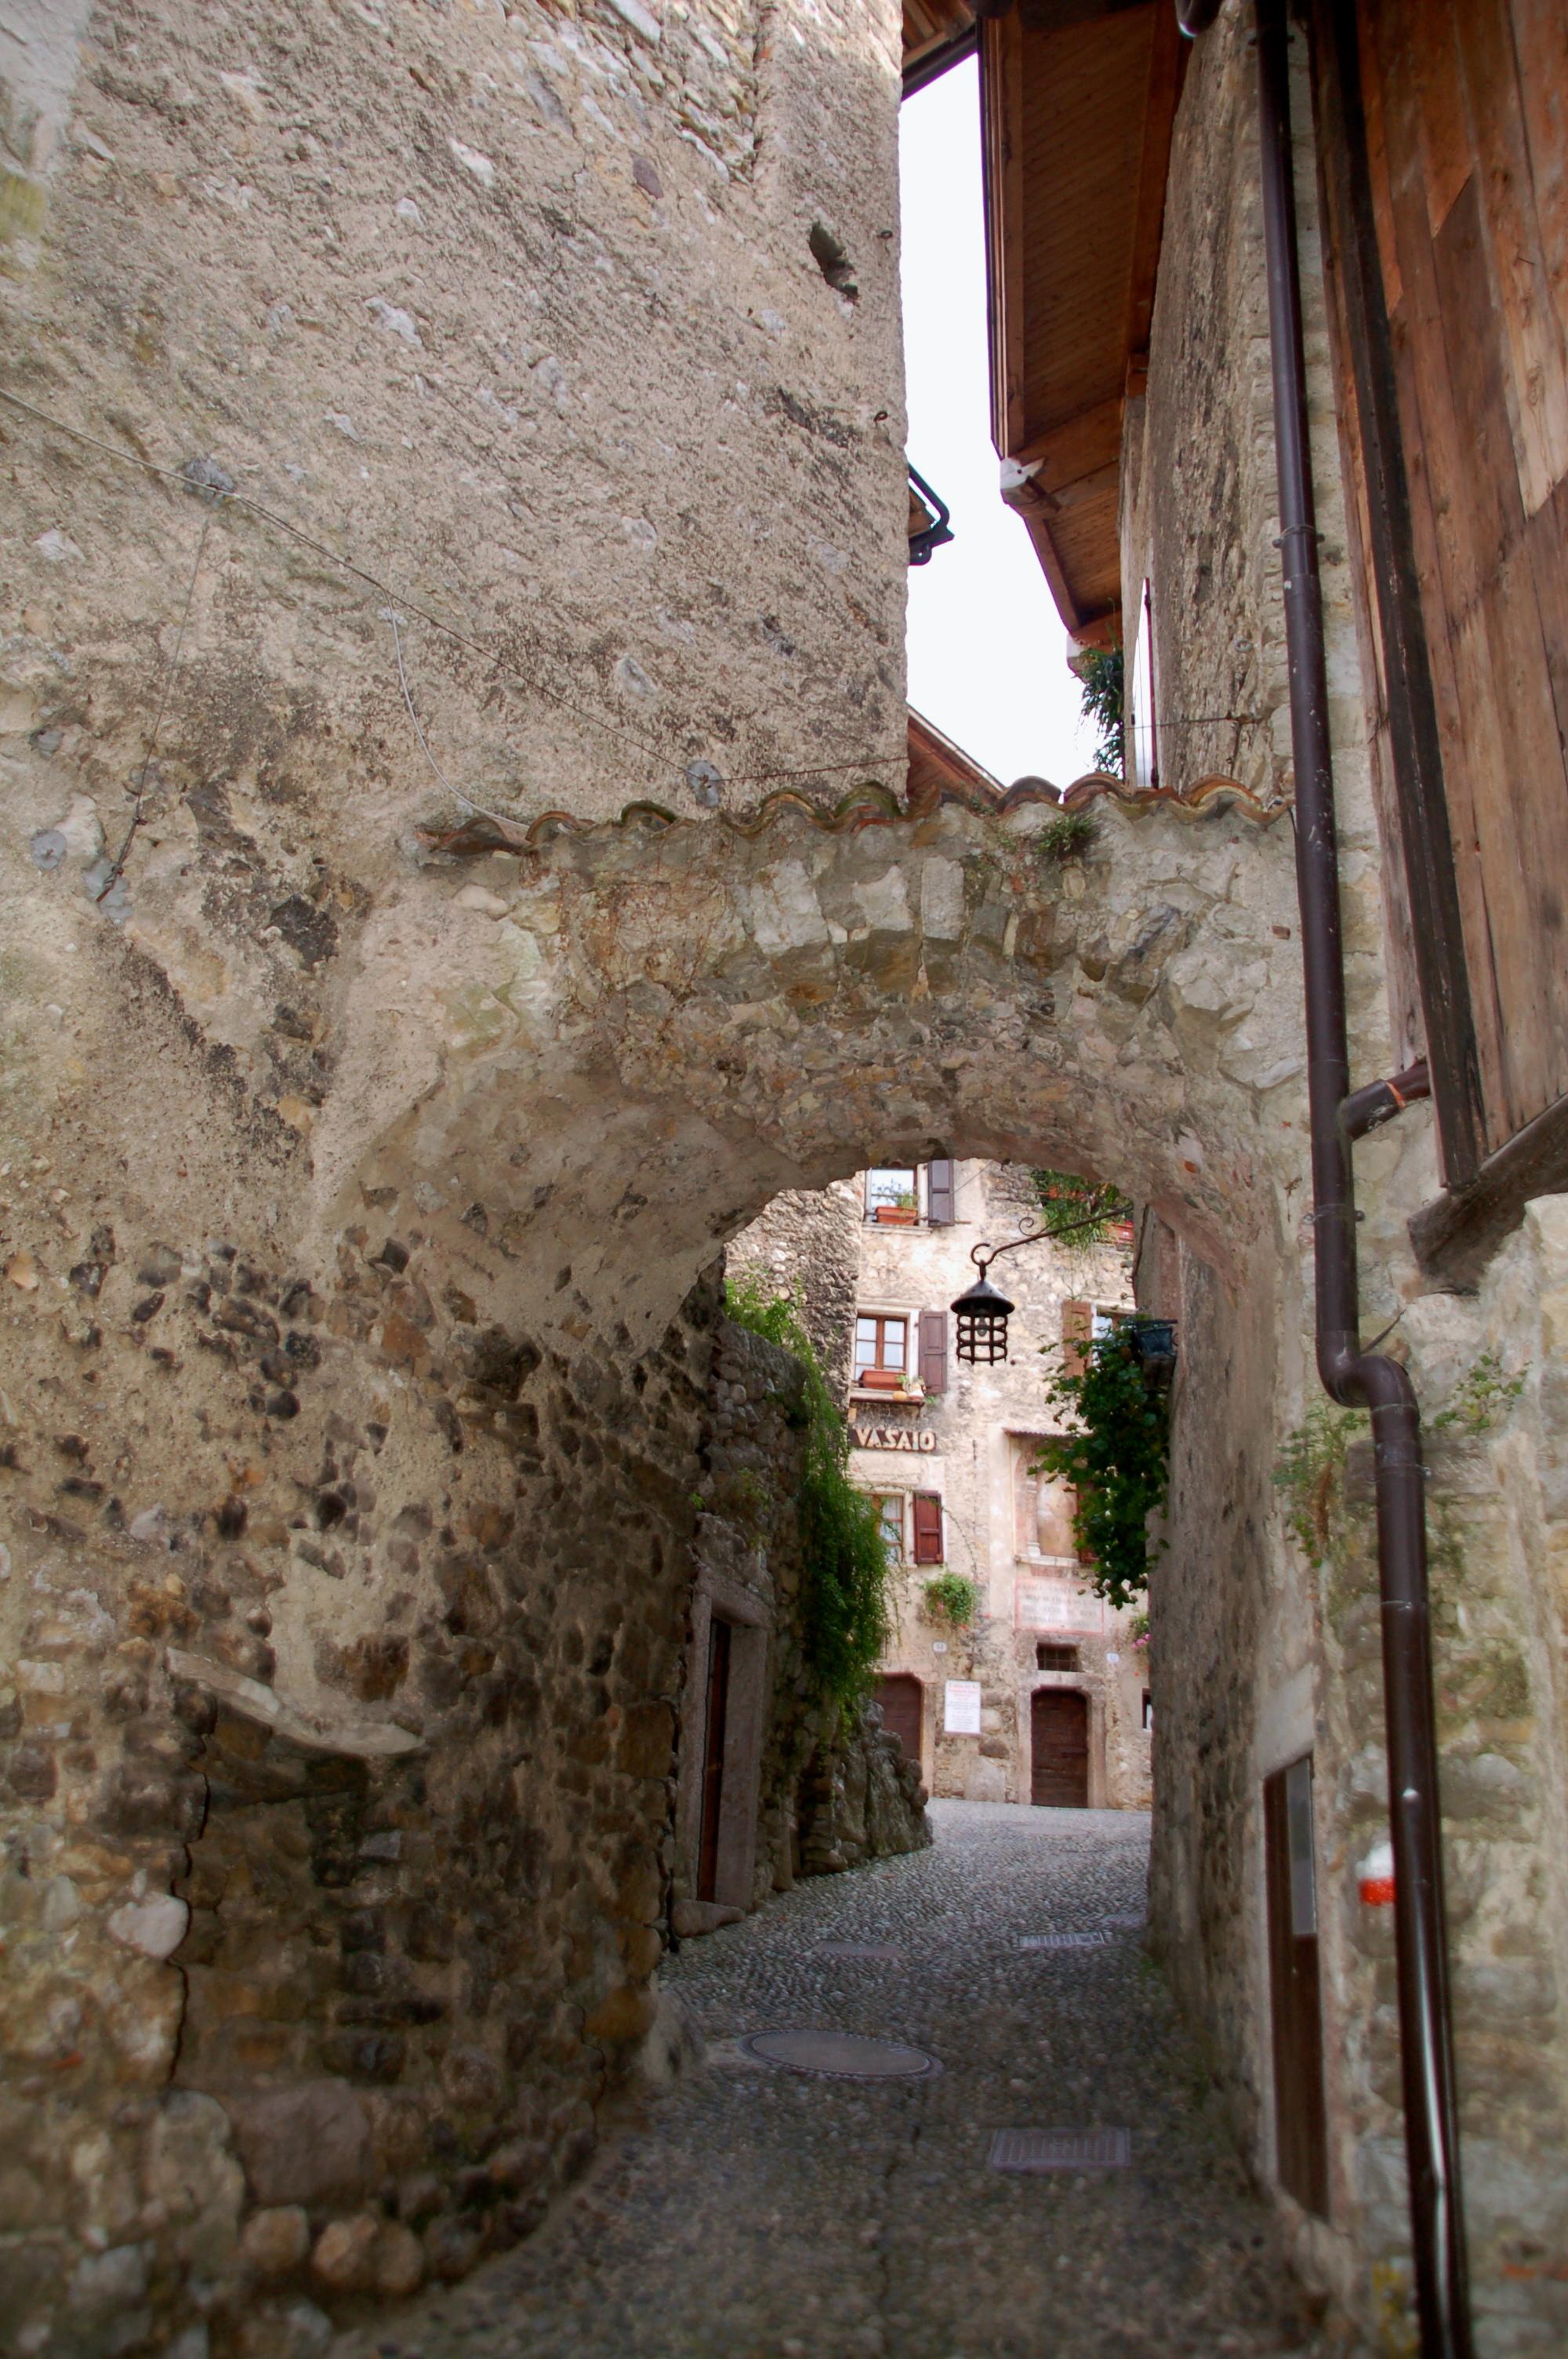 Torbogen in Gasse von Canale di Tenno Borgho